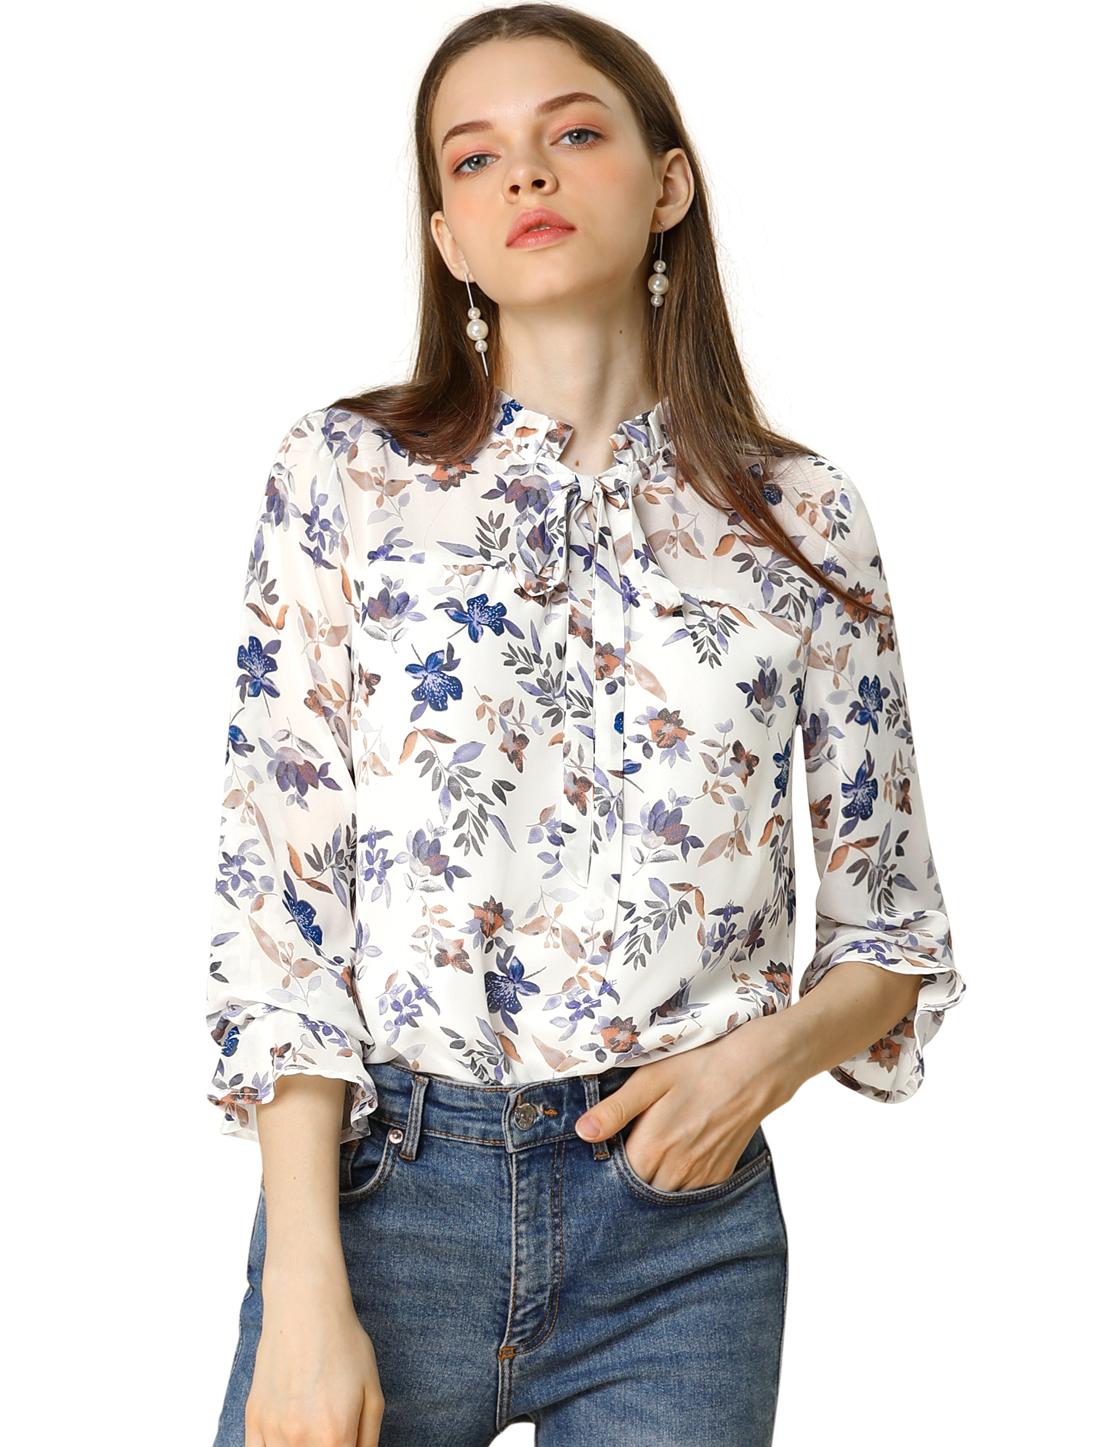 Allegra K Women's Long Sleeve Tie Neck Ruffle Collar Floral Print Top White XS